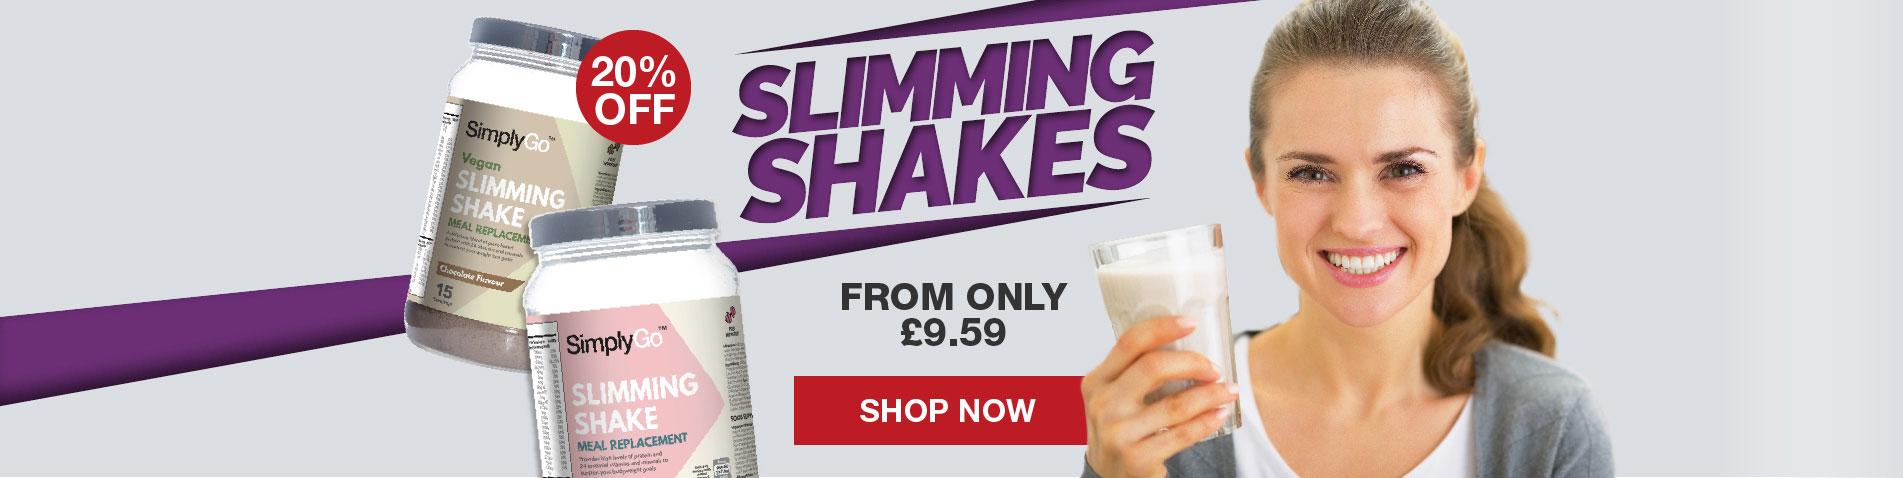 SimplyGo Slimming Shakes